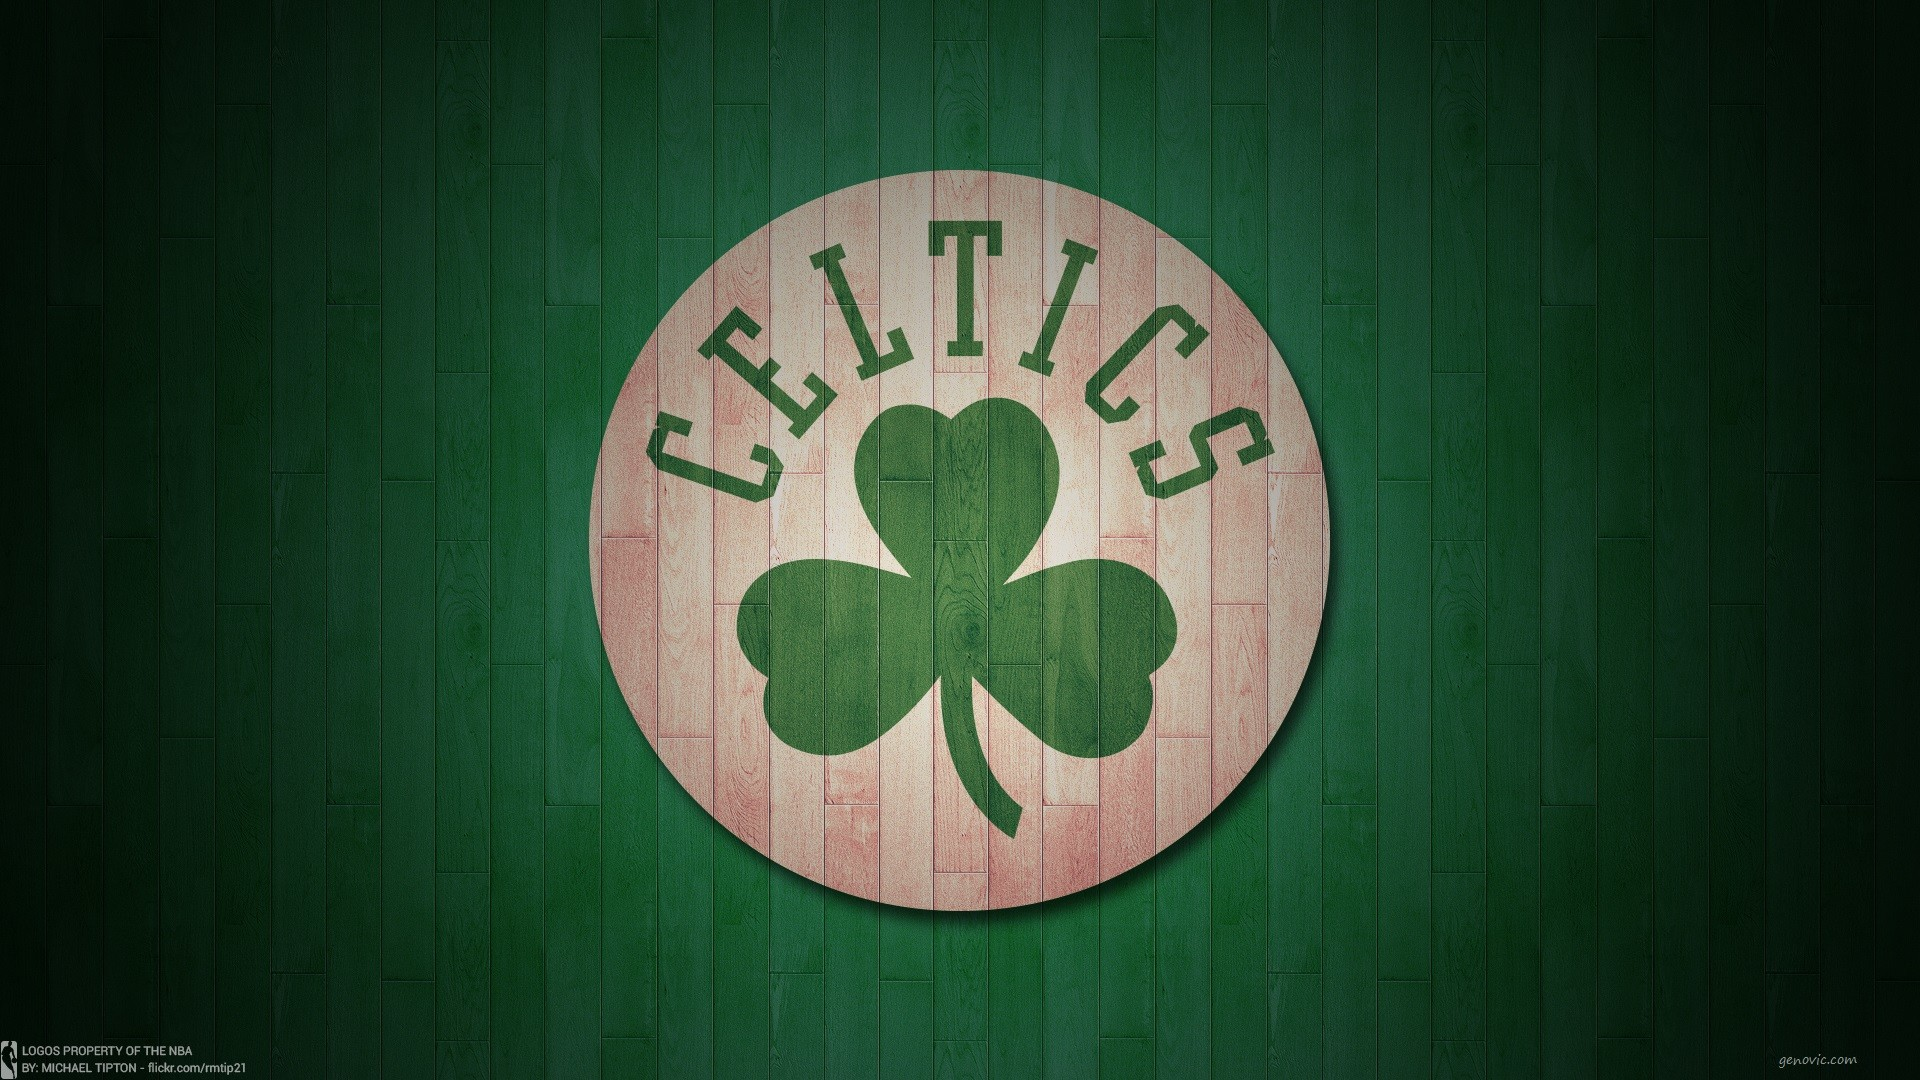 1920x1080 Boston Celtics Wallpapers HD Download 1600×1200 Boston Celtics Wallpaper (47 Wallpapers)